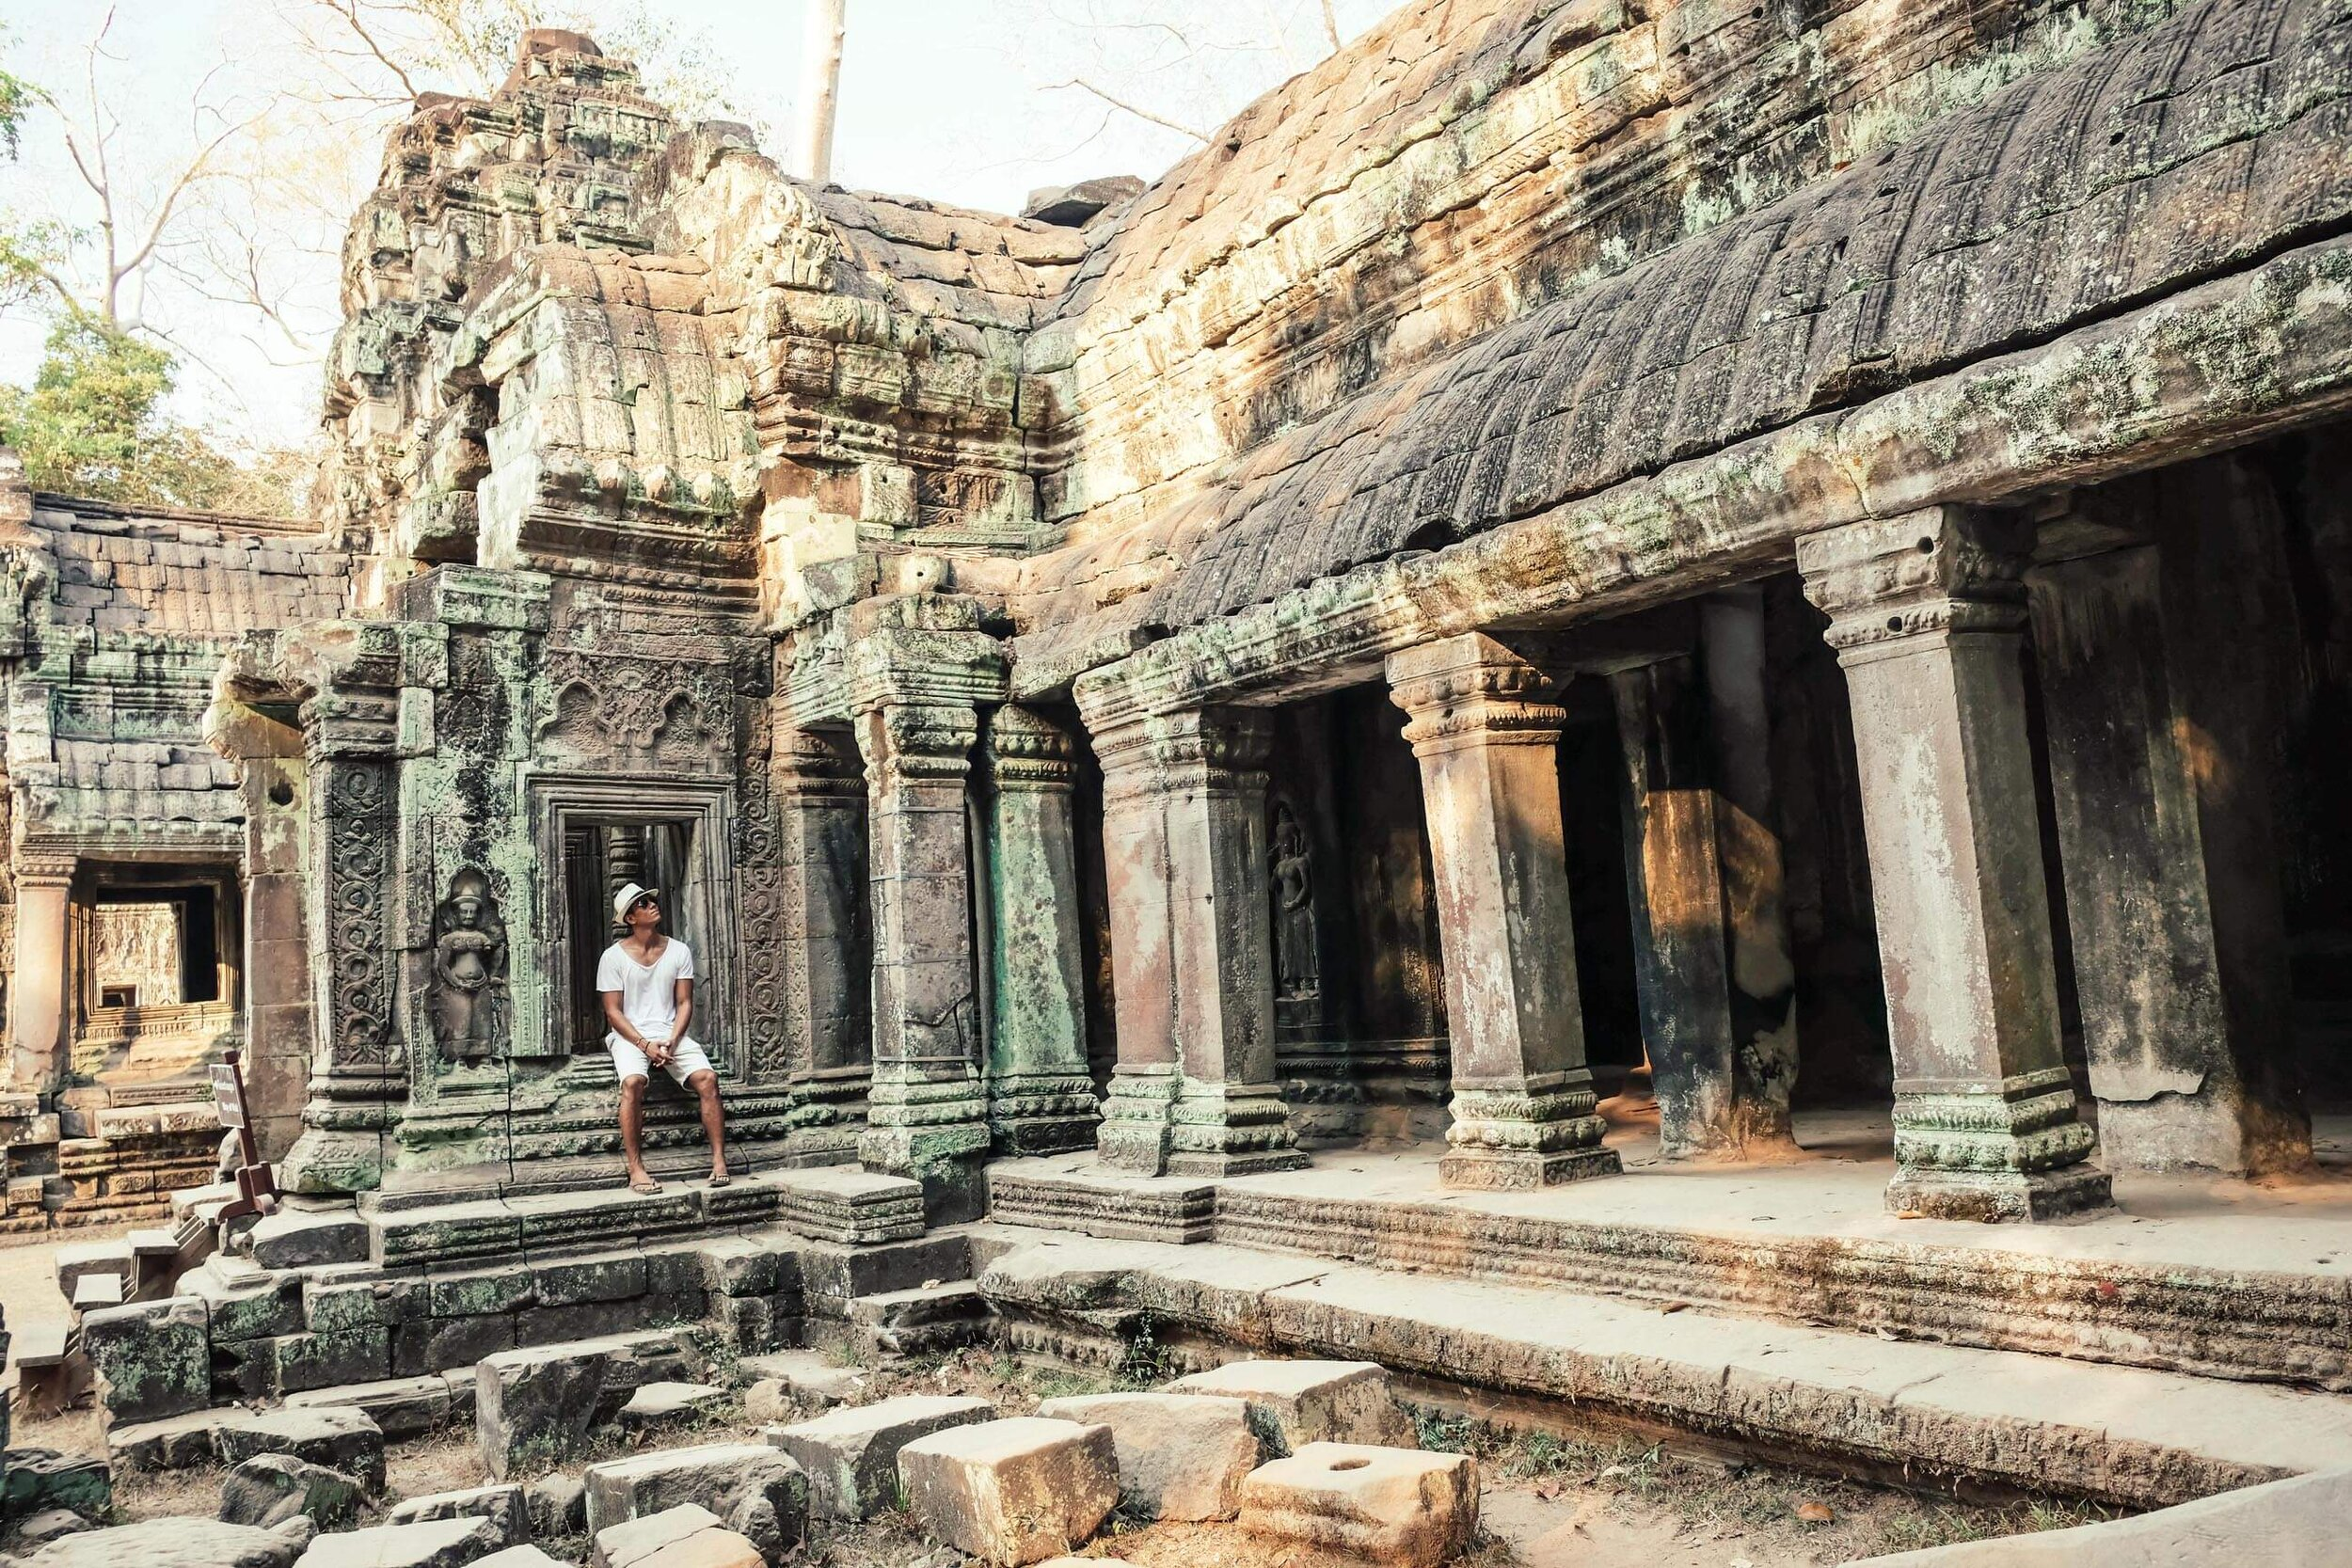 minimalray-minimalism-frugal-simple-Cambodia.jpg